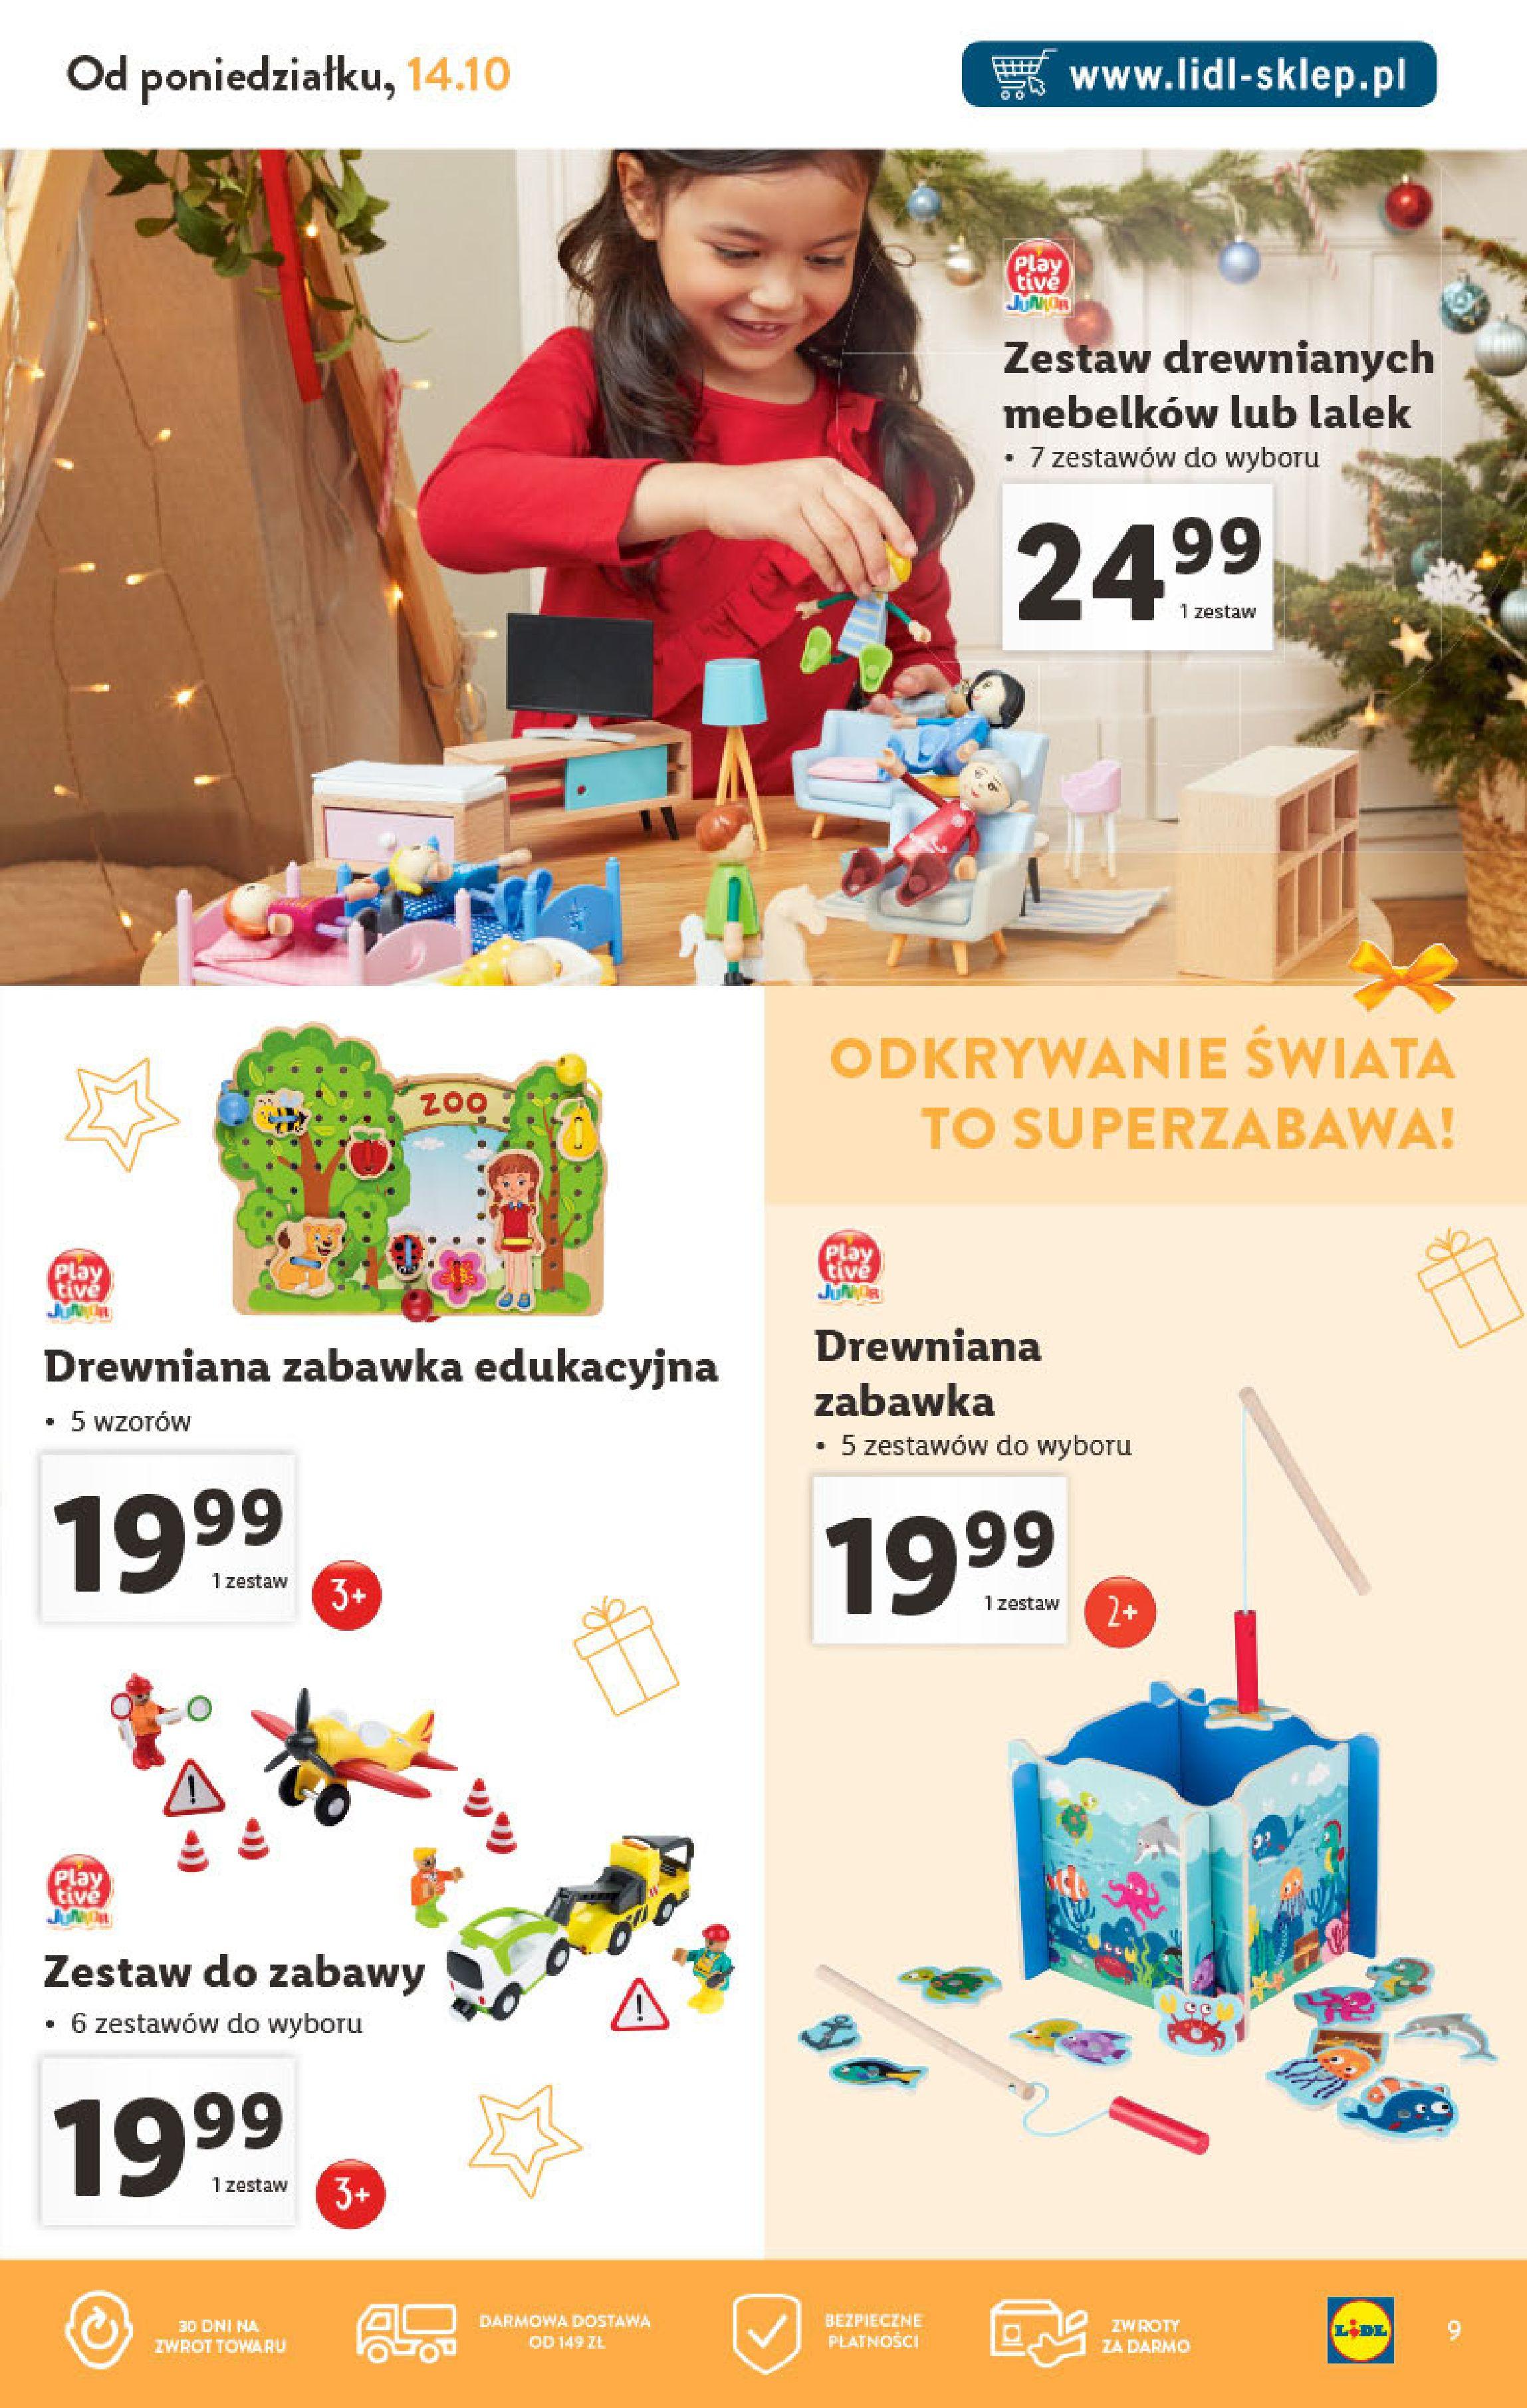 Gazetka Lidl - Katalog Online-13.10.2019-02.12.2019-page-9